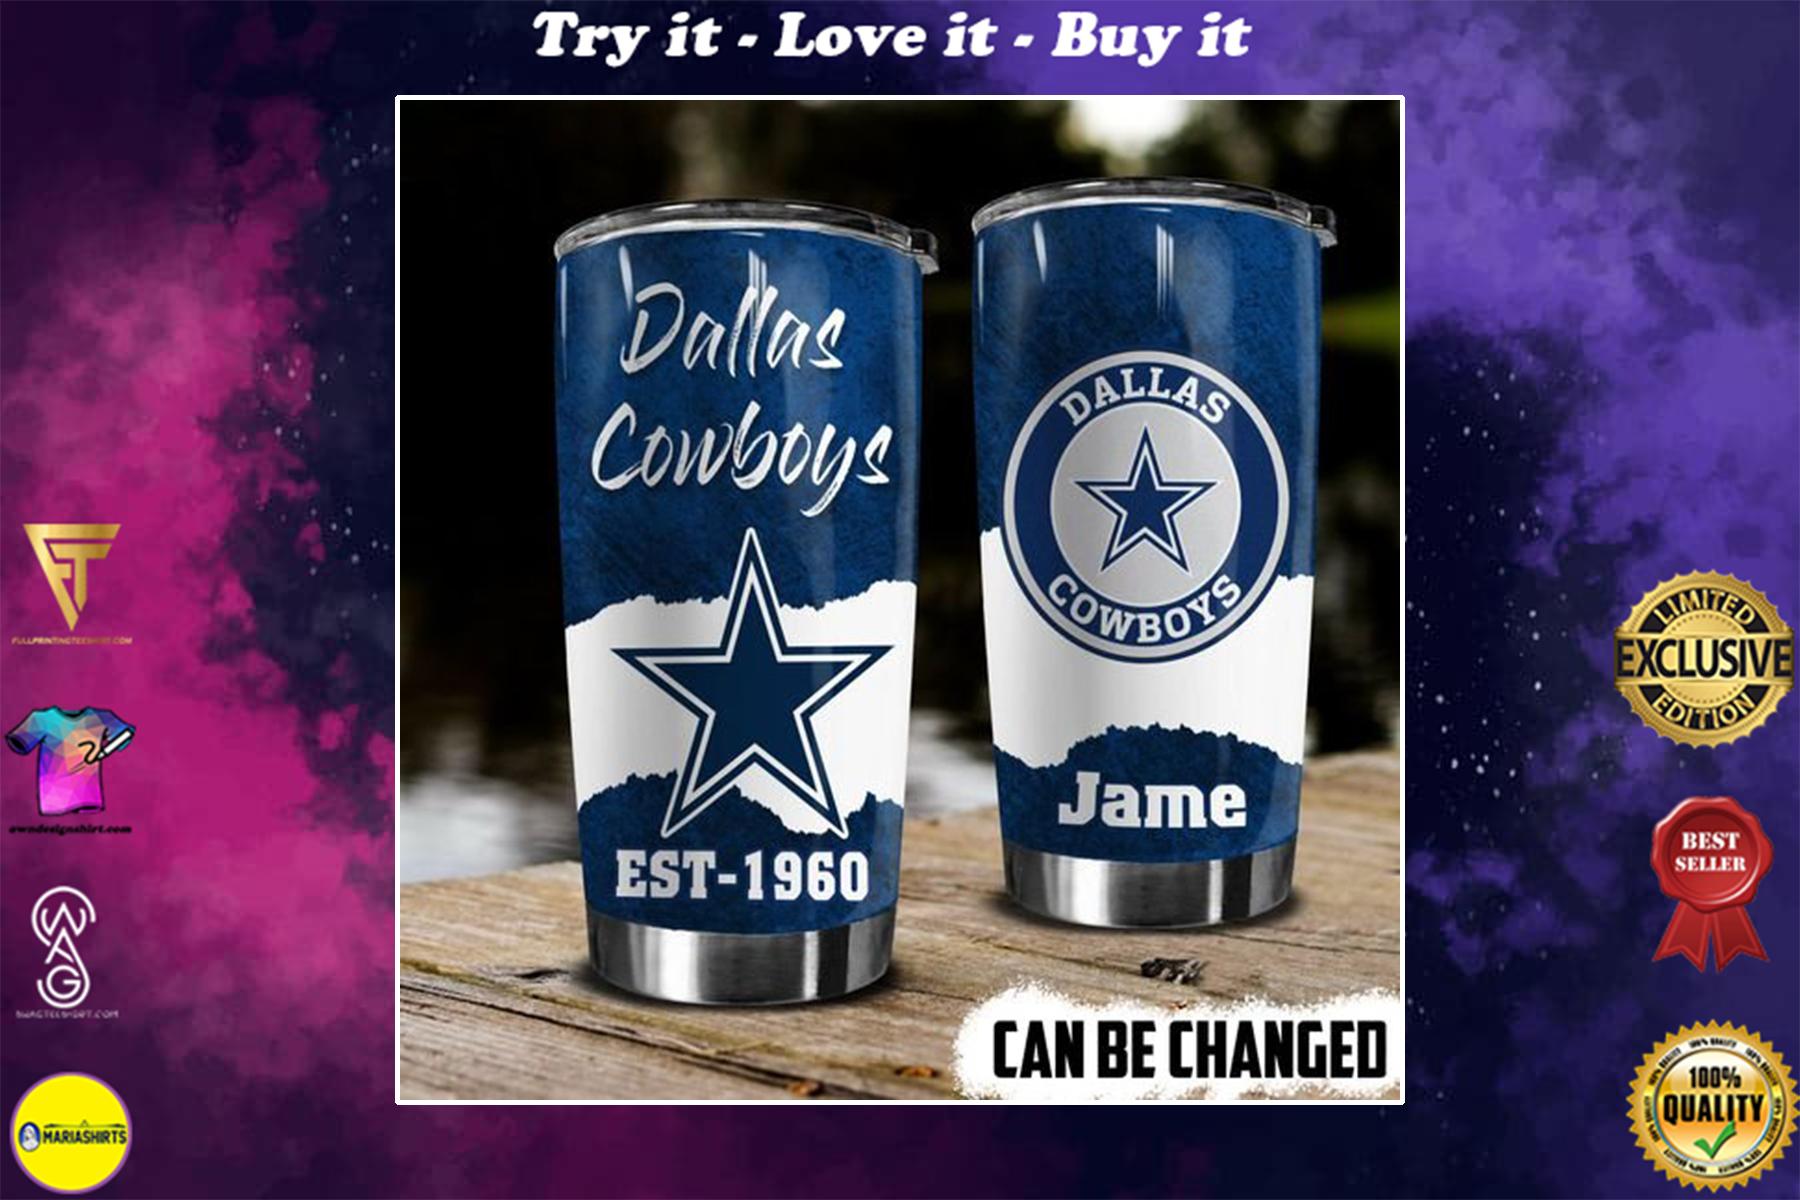 [special edition] custom name dallas cowboys football team tumbler - maria